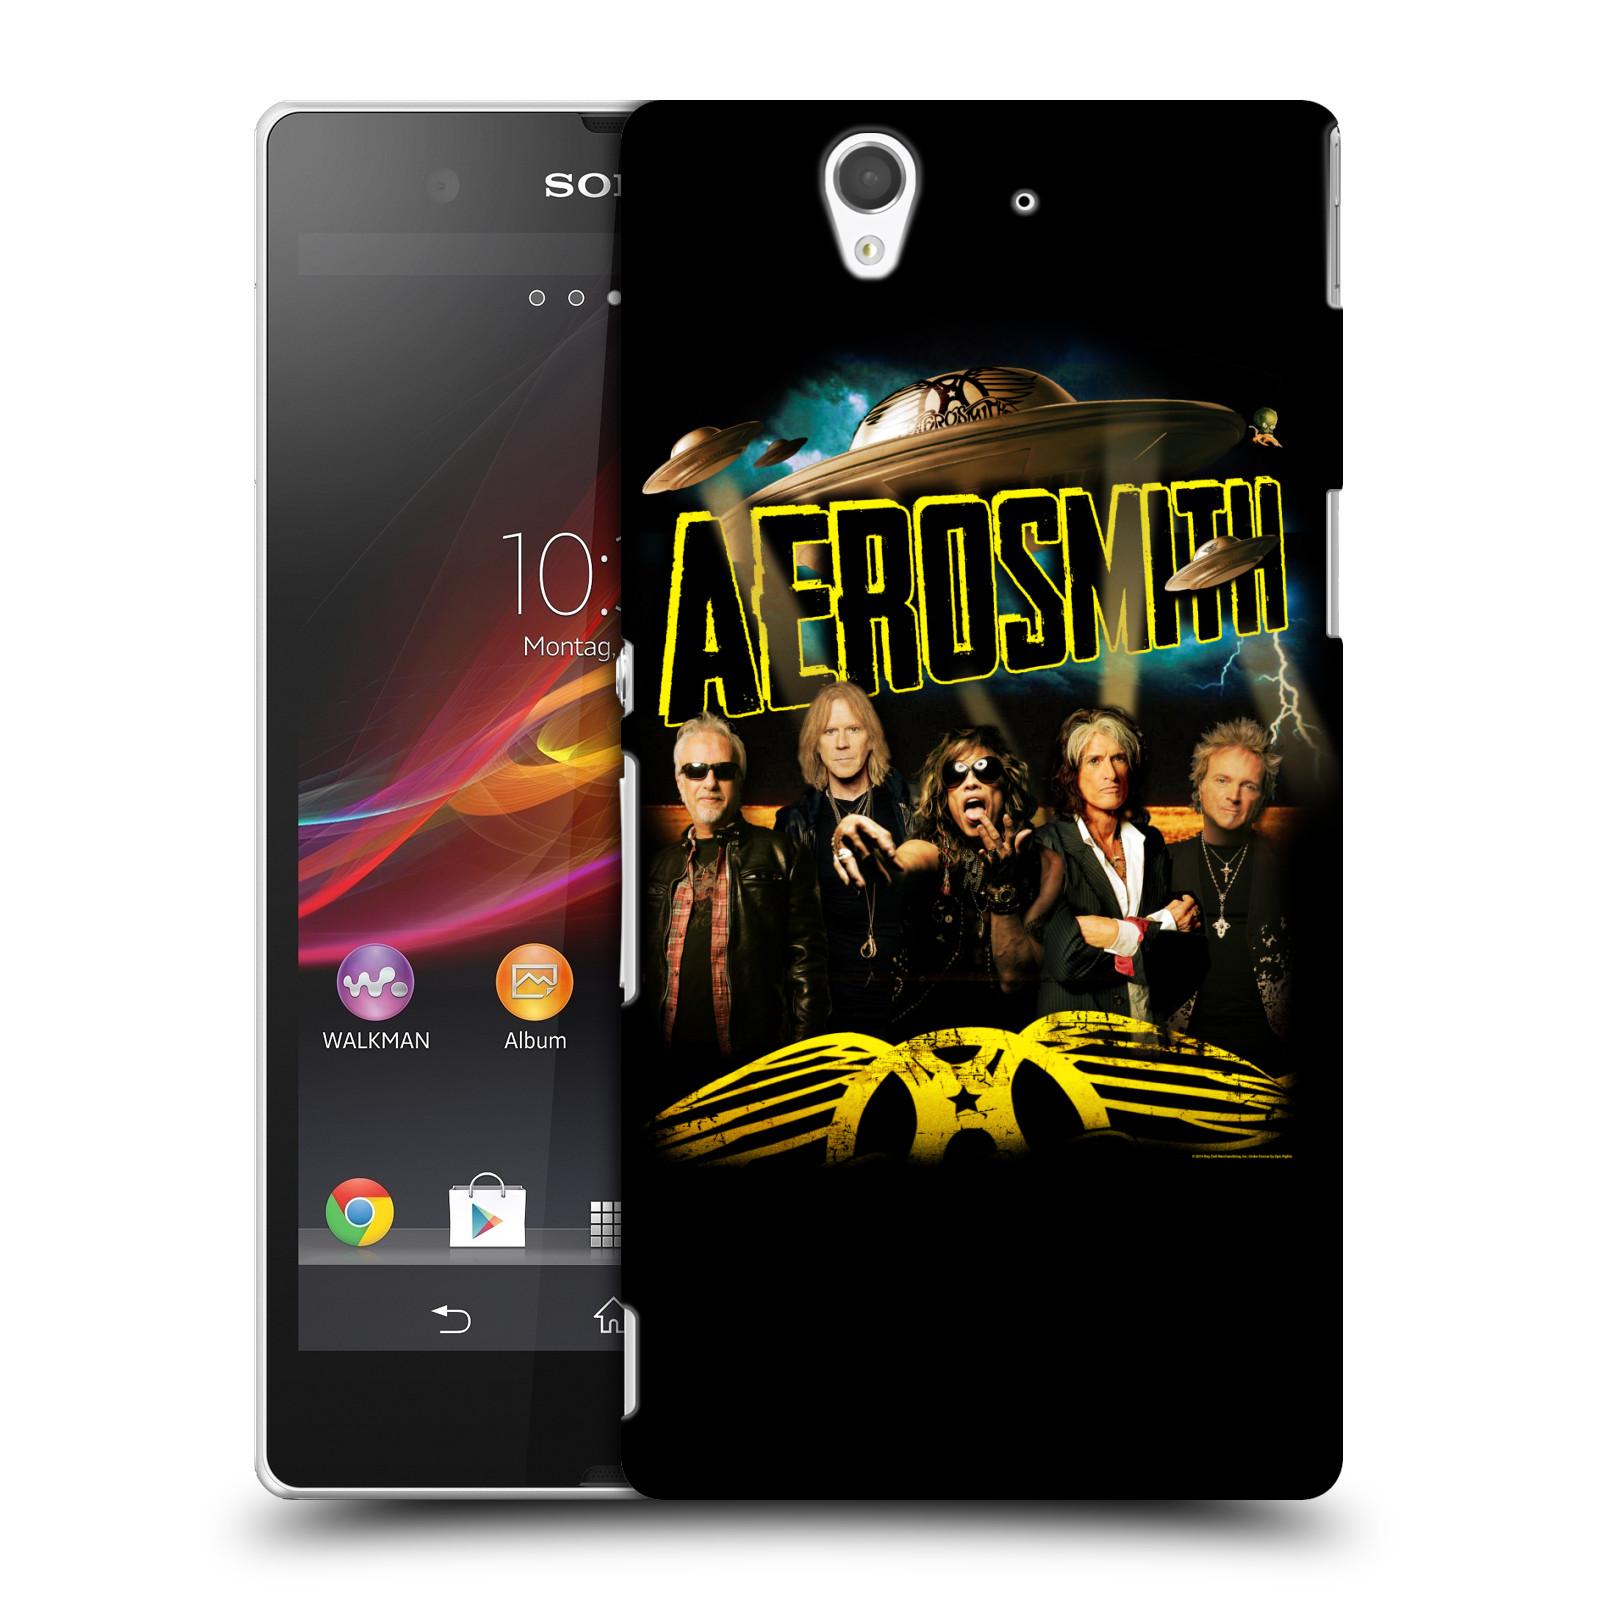 Plastové pouzdro na mobil Sony Xperia Z C6603 HEAD CASE - Aerosmith - Global Warming (Plastový kryt či obal na mobilní telefon s licencovaným motivem Aerosmith pro Sony Xperia Z)